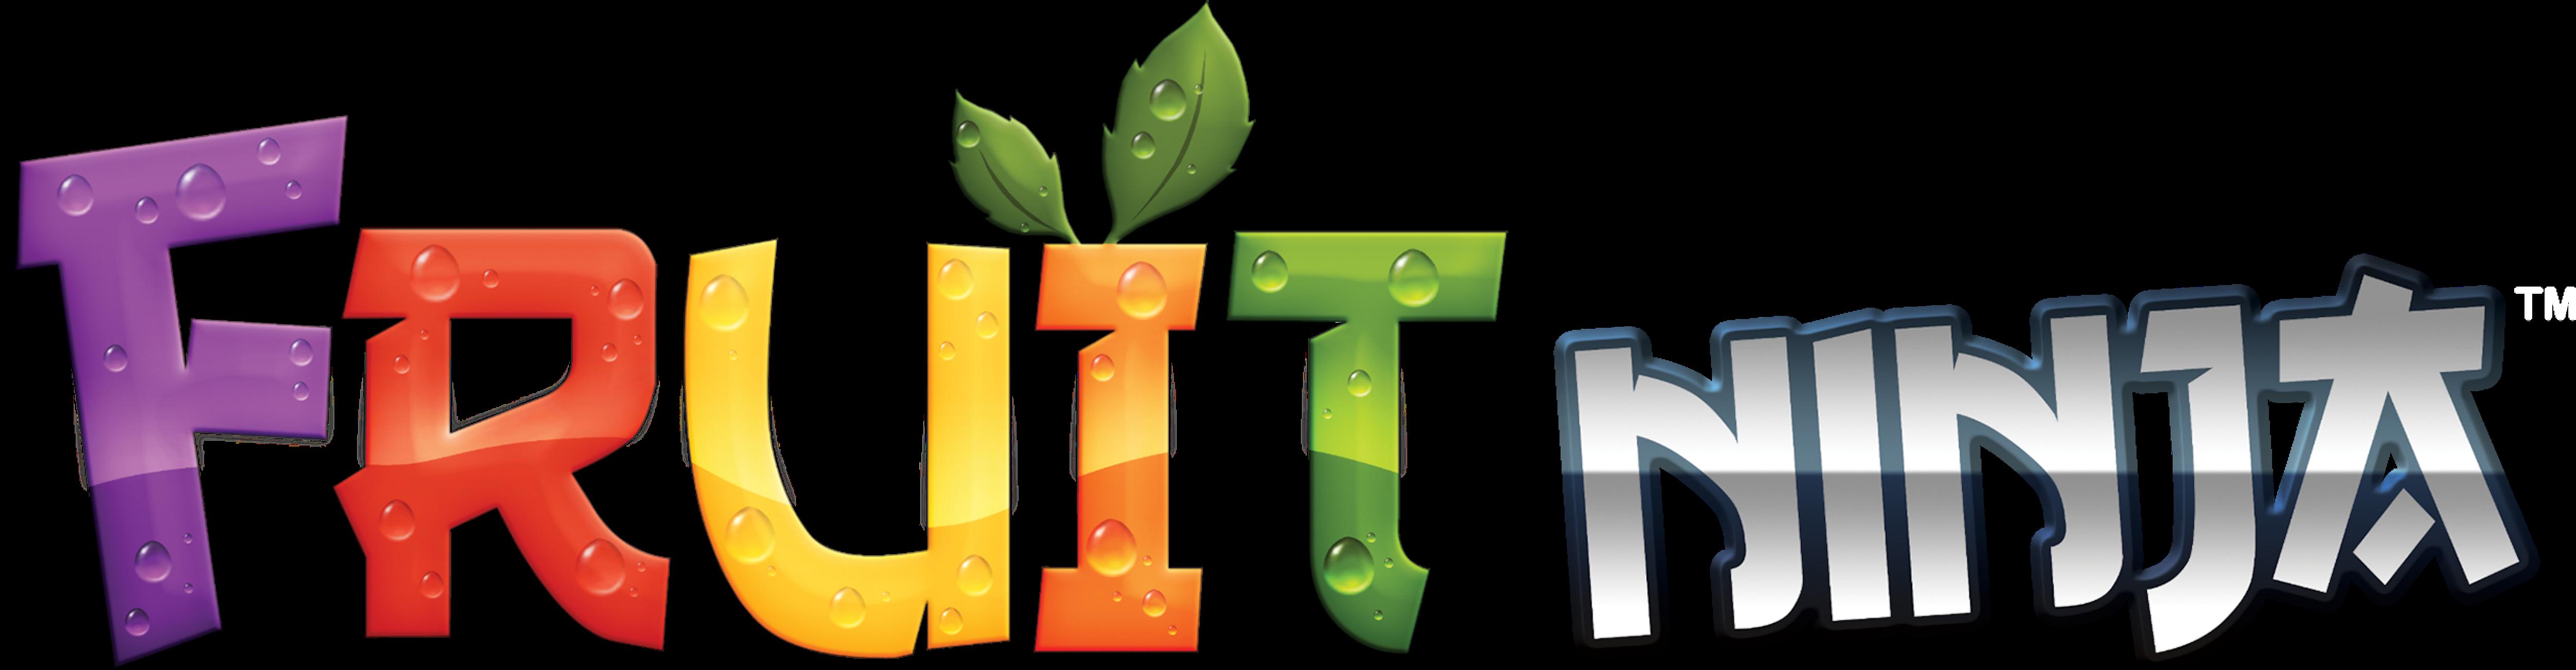 File:Wikia-Visualization-Main,fruitninja.png